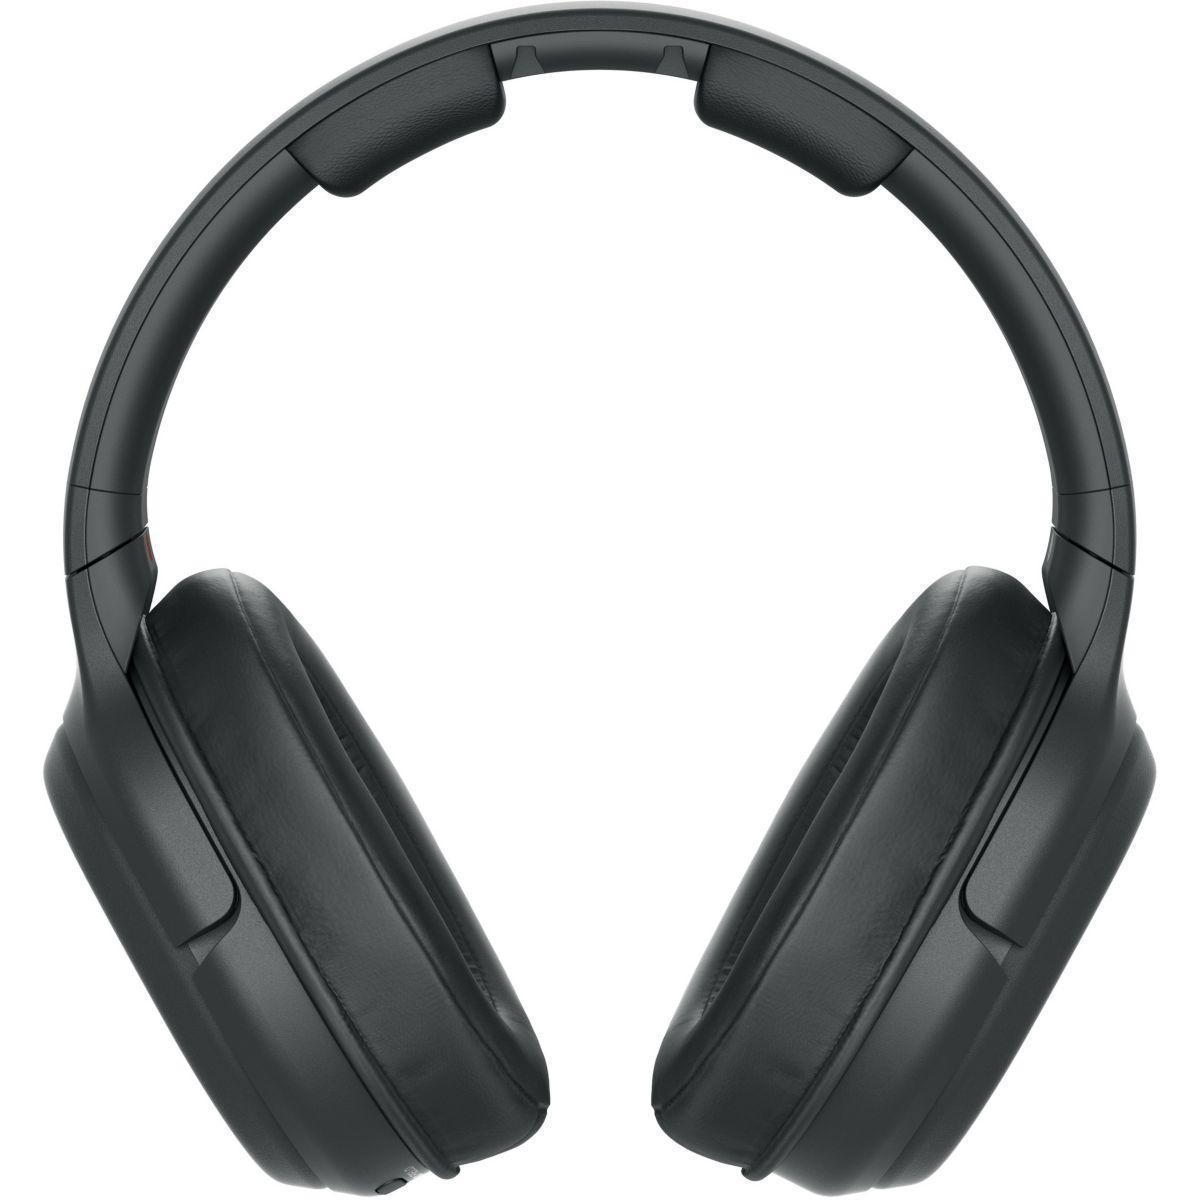 Sony WH-L600 Noise-Cancelling Headphones - Black